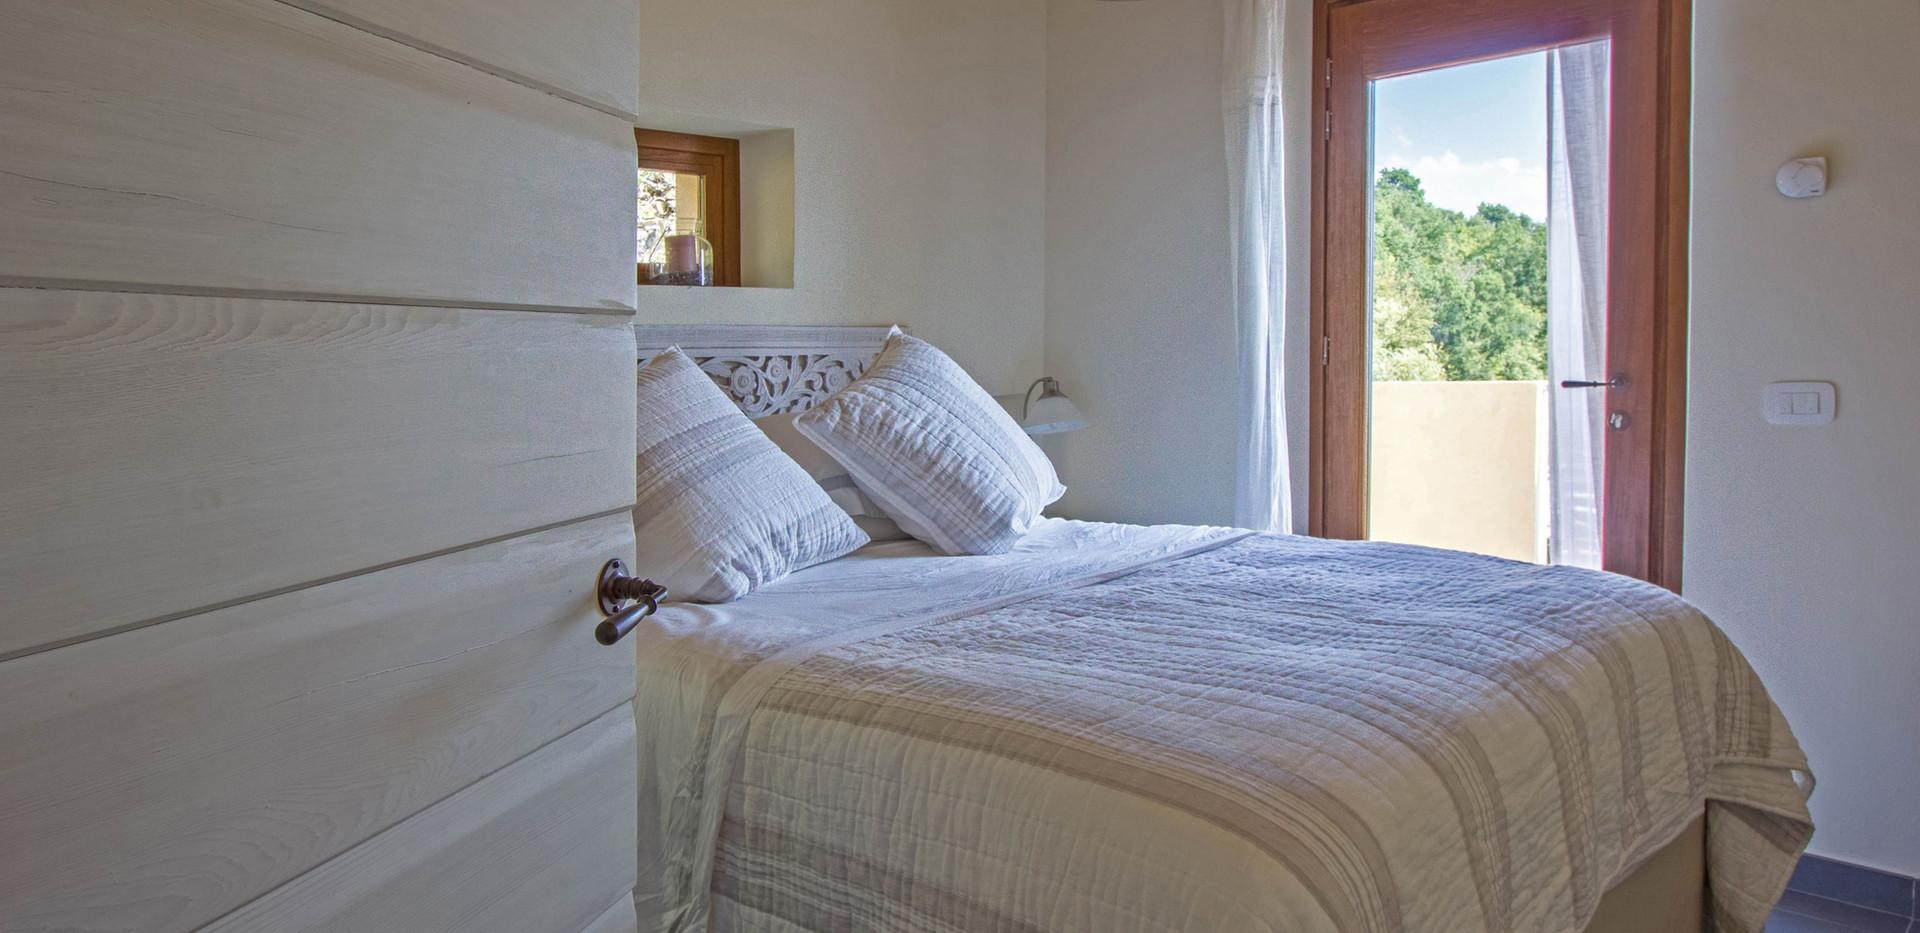 Bedroom 2  _5501-HDR_risultato.jpg